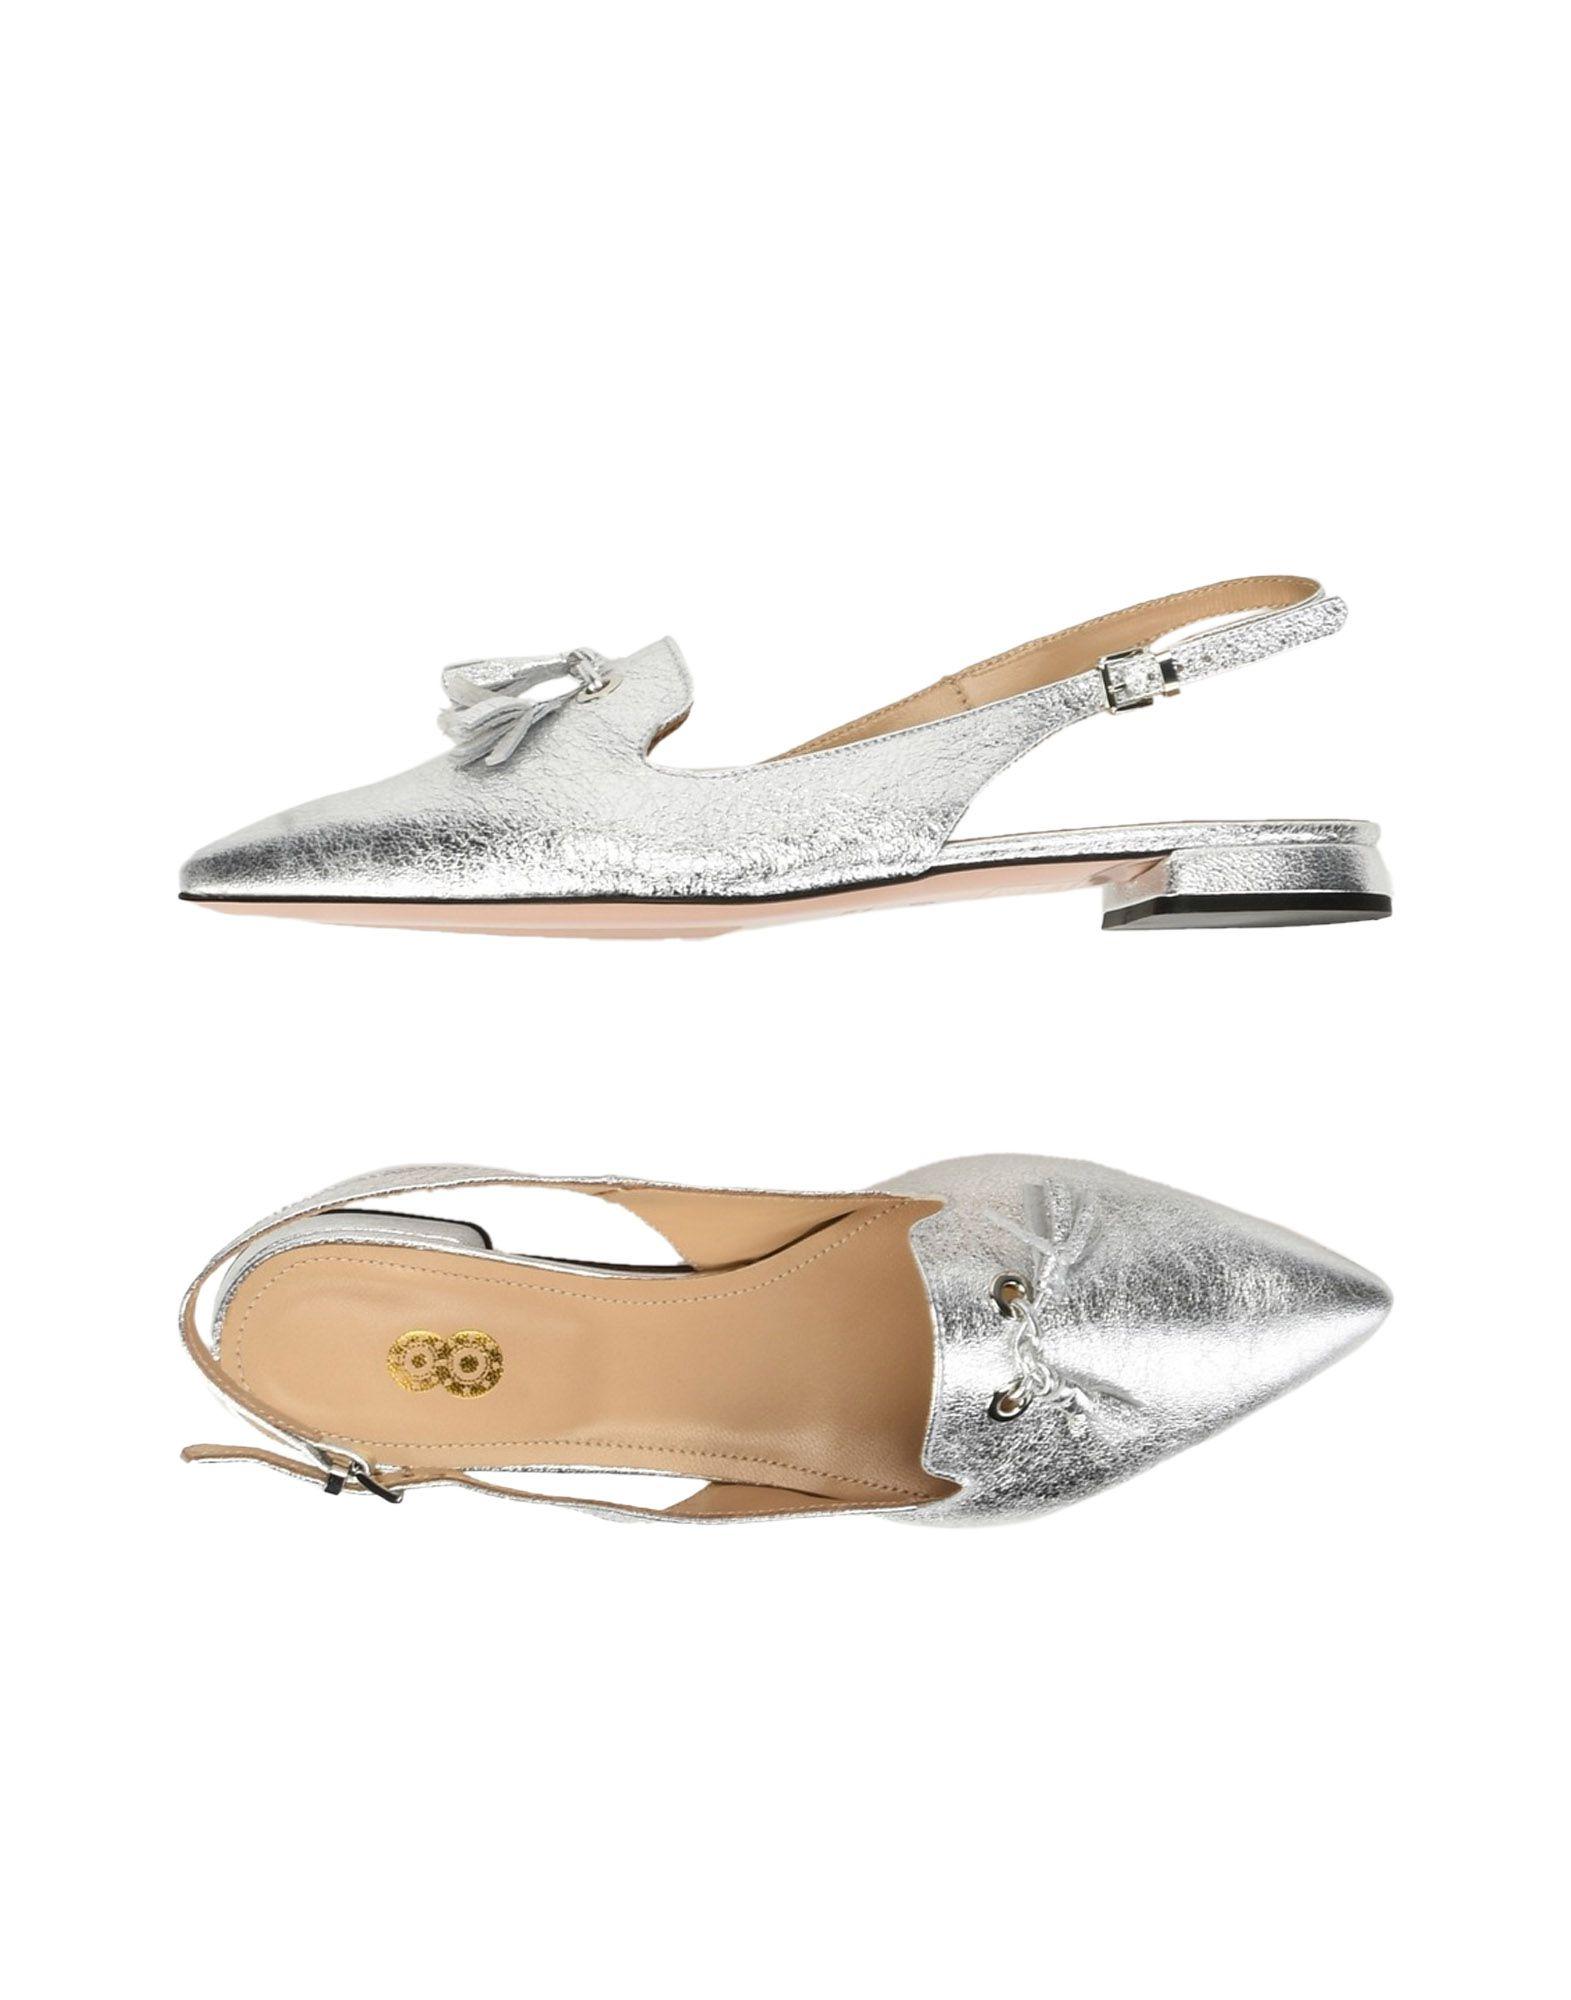 8 Ballet Ballet Ballet Flats - Women 8 Ballet Flats online on  United Kingdom - 11458377QB 362c4a